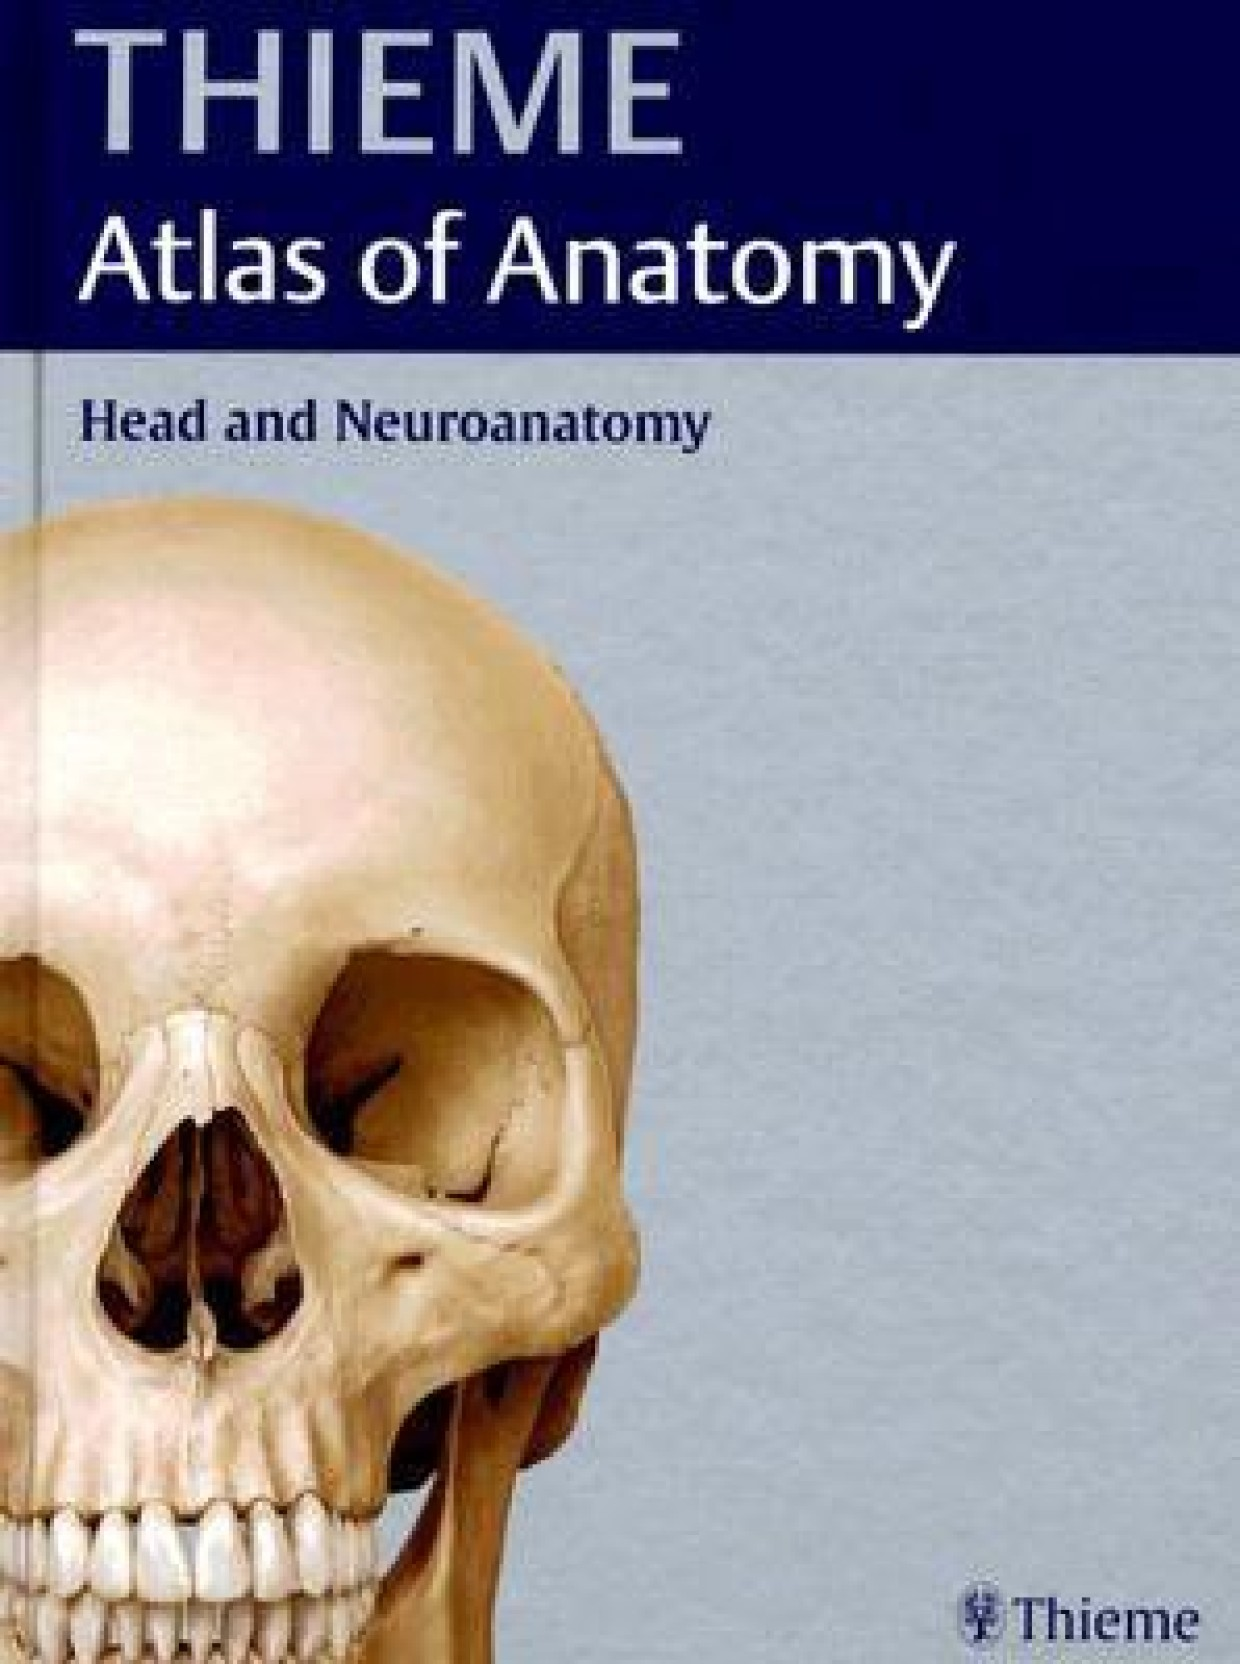 Head and Neuroanatomy: Thieme Atlas of Anatomy( Series - Thieme ...